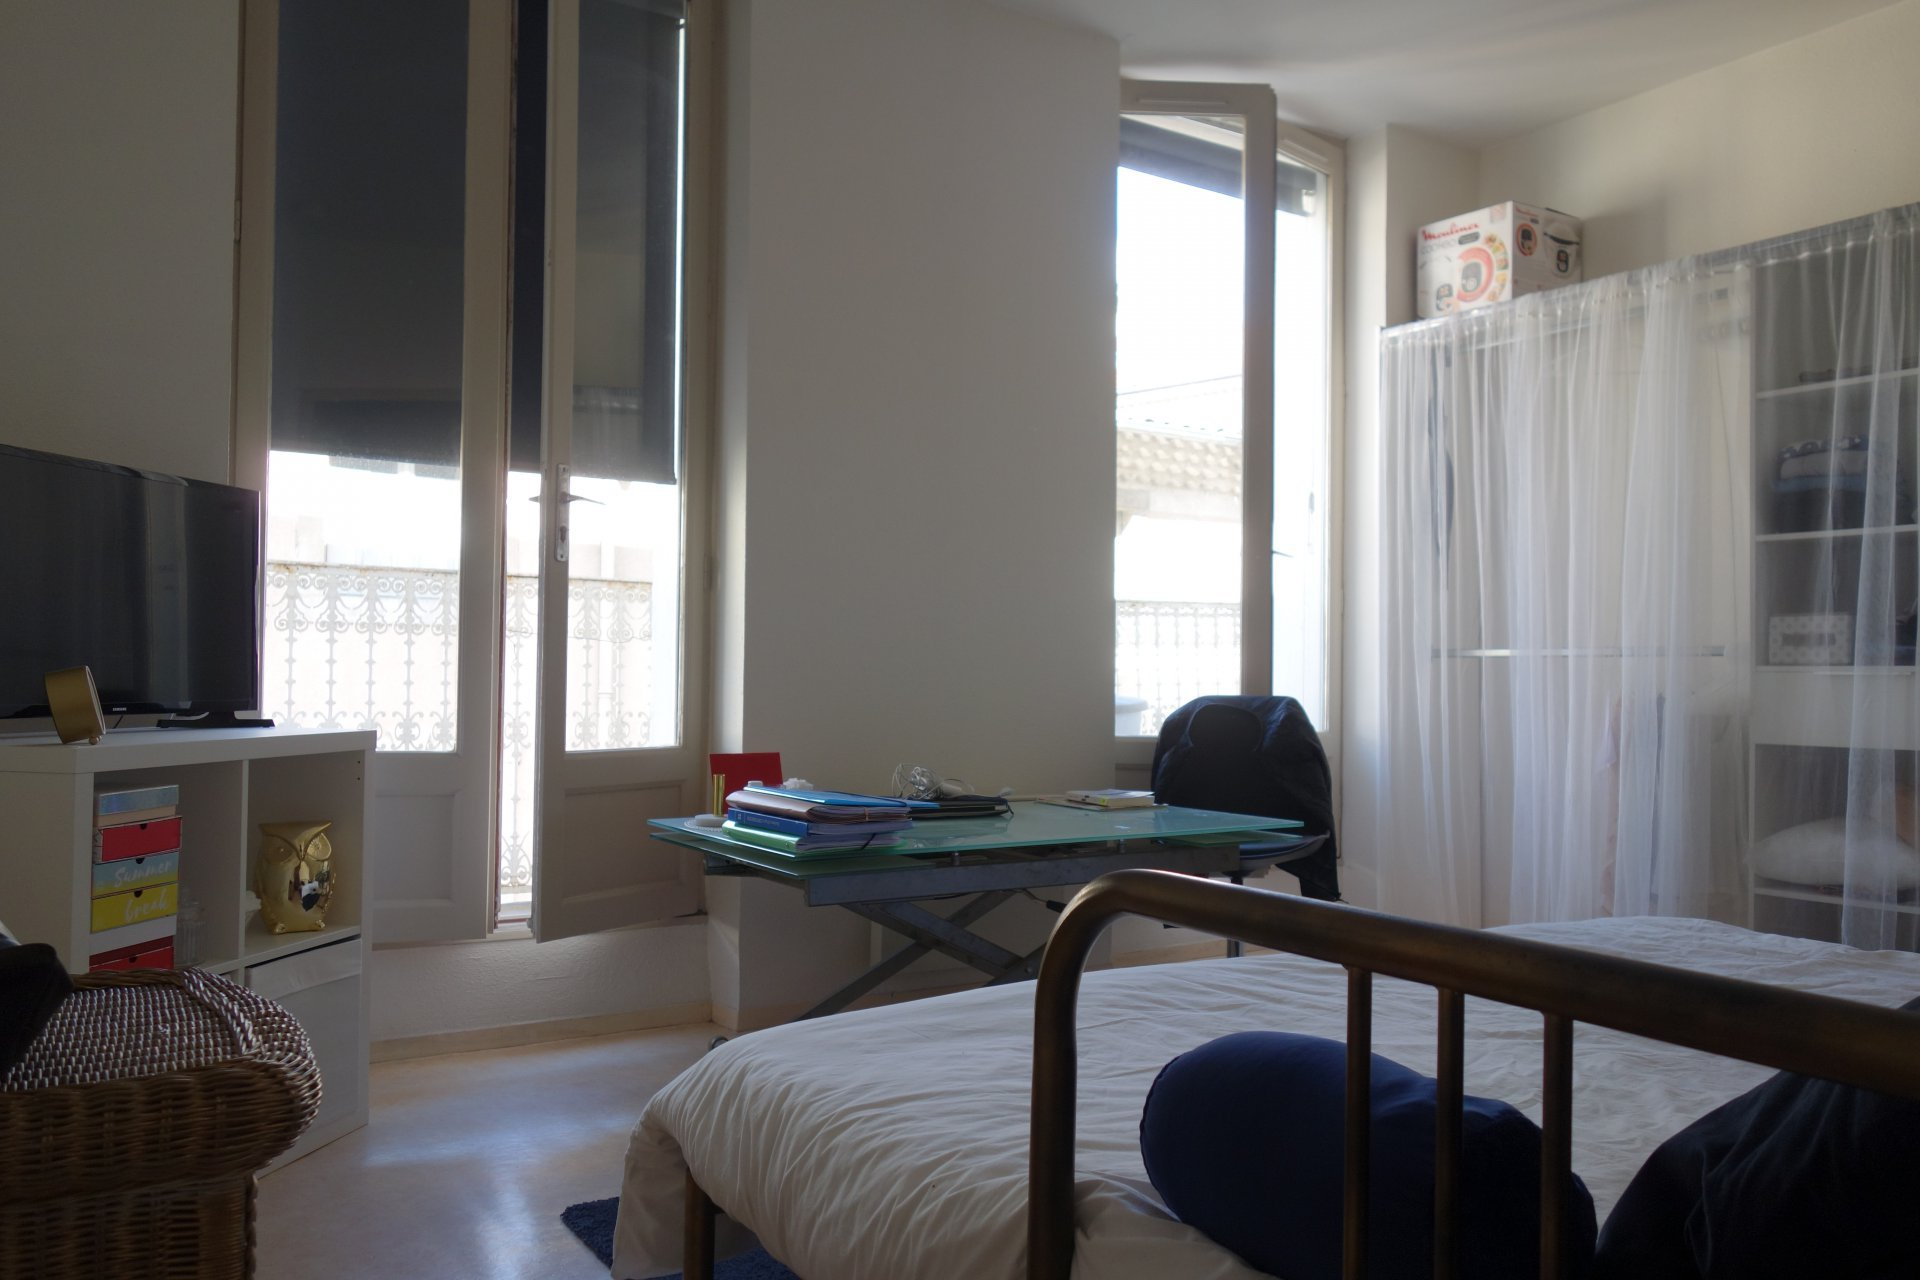 A LOUER - Studio avec balcon lumineux